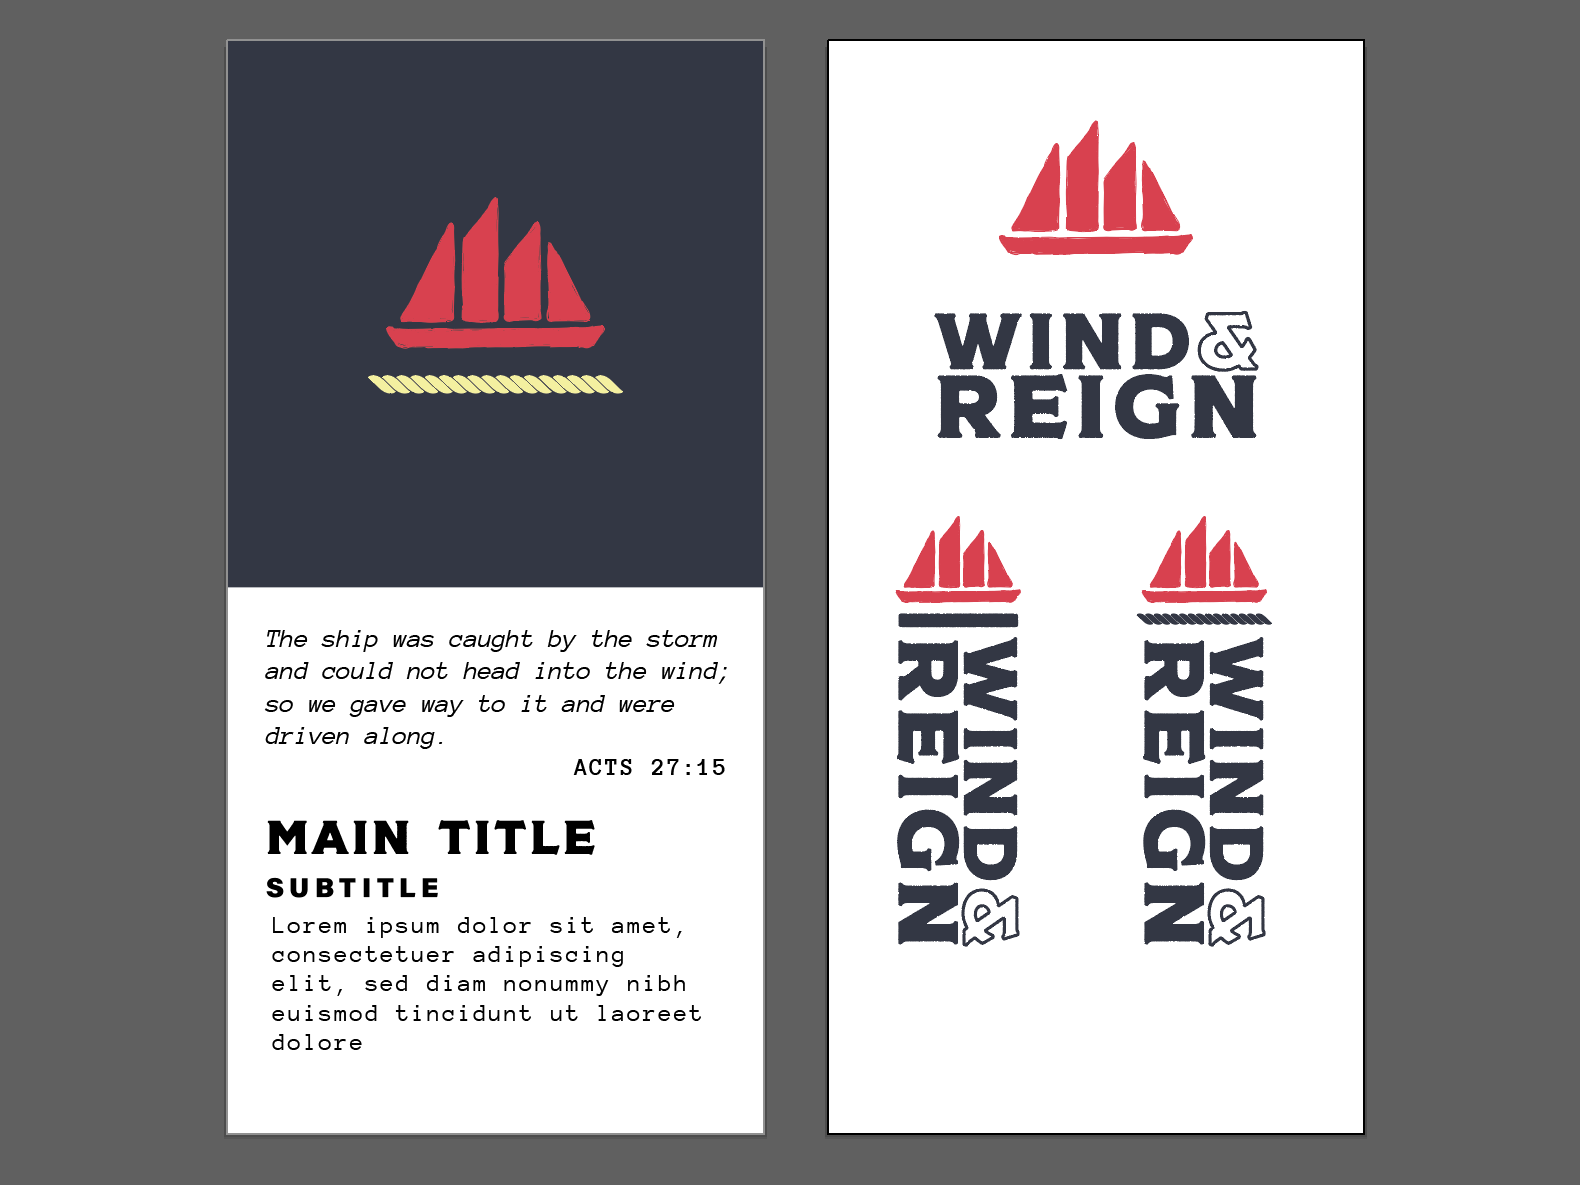 Wind & Reign Event Design nautical ship wind typography logo event branding design